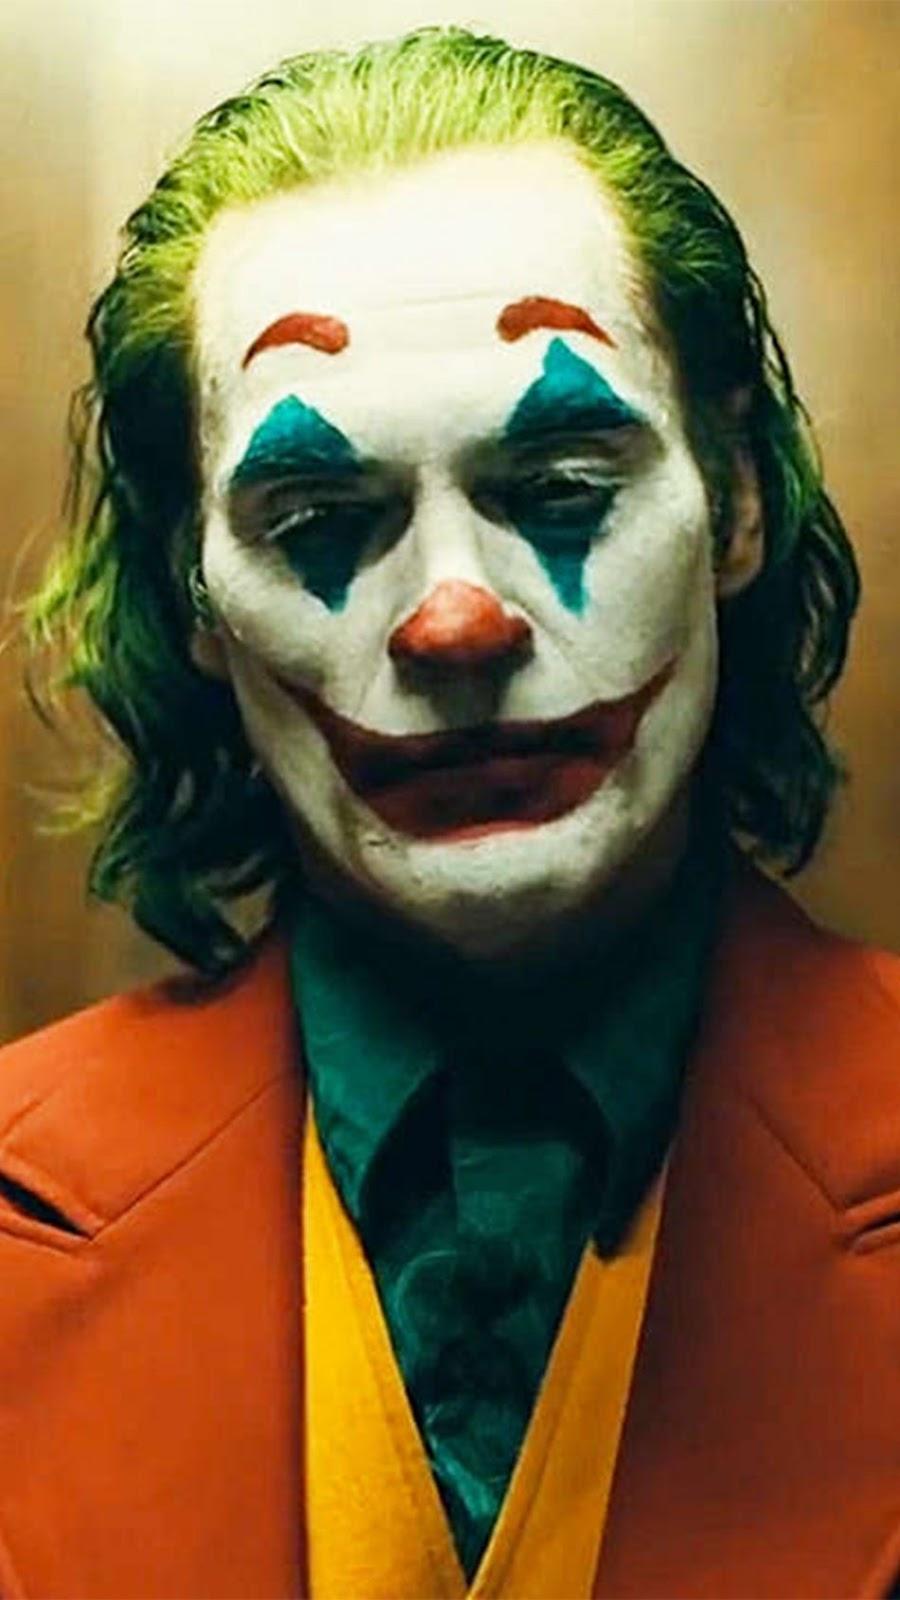 joker-wallpaper-2019